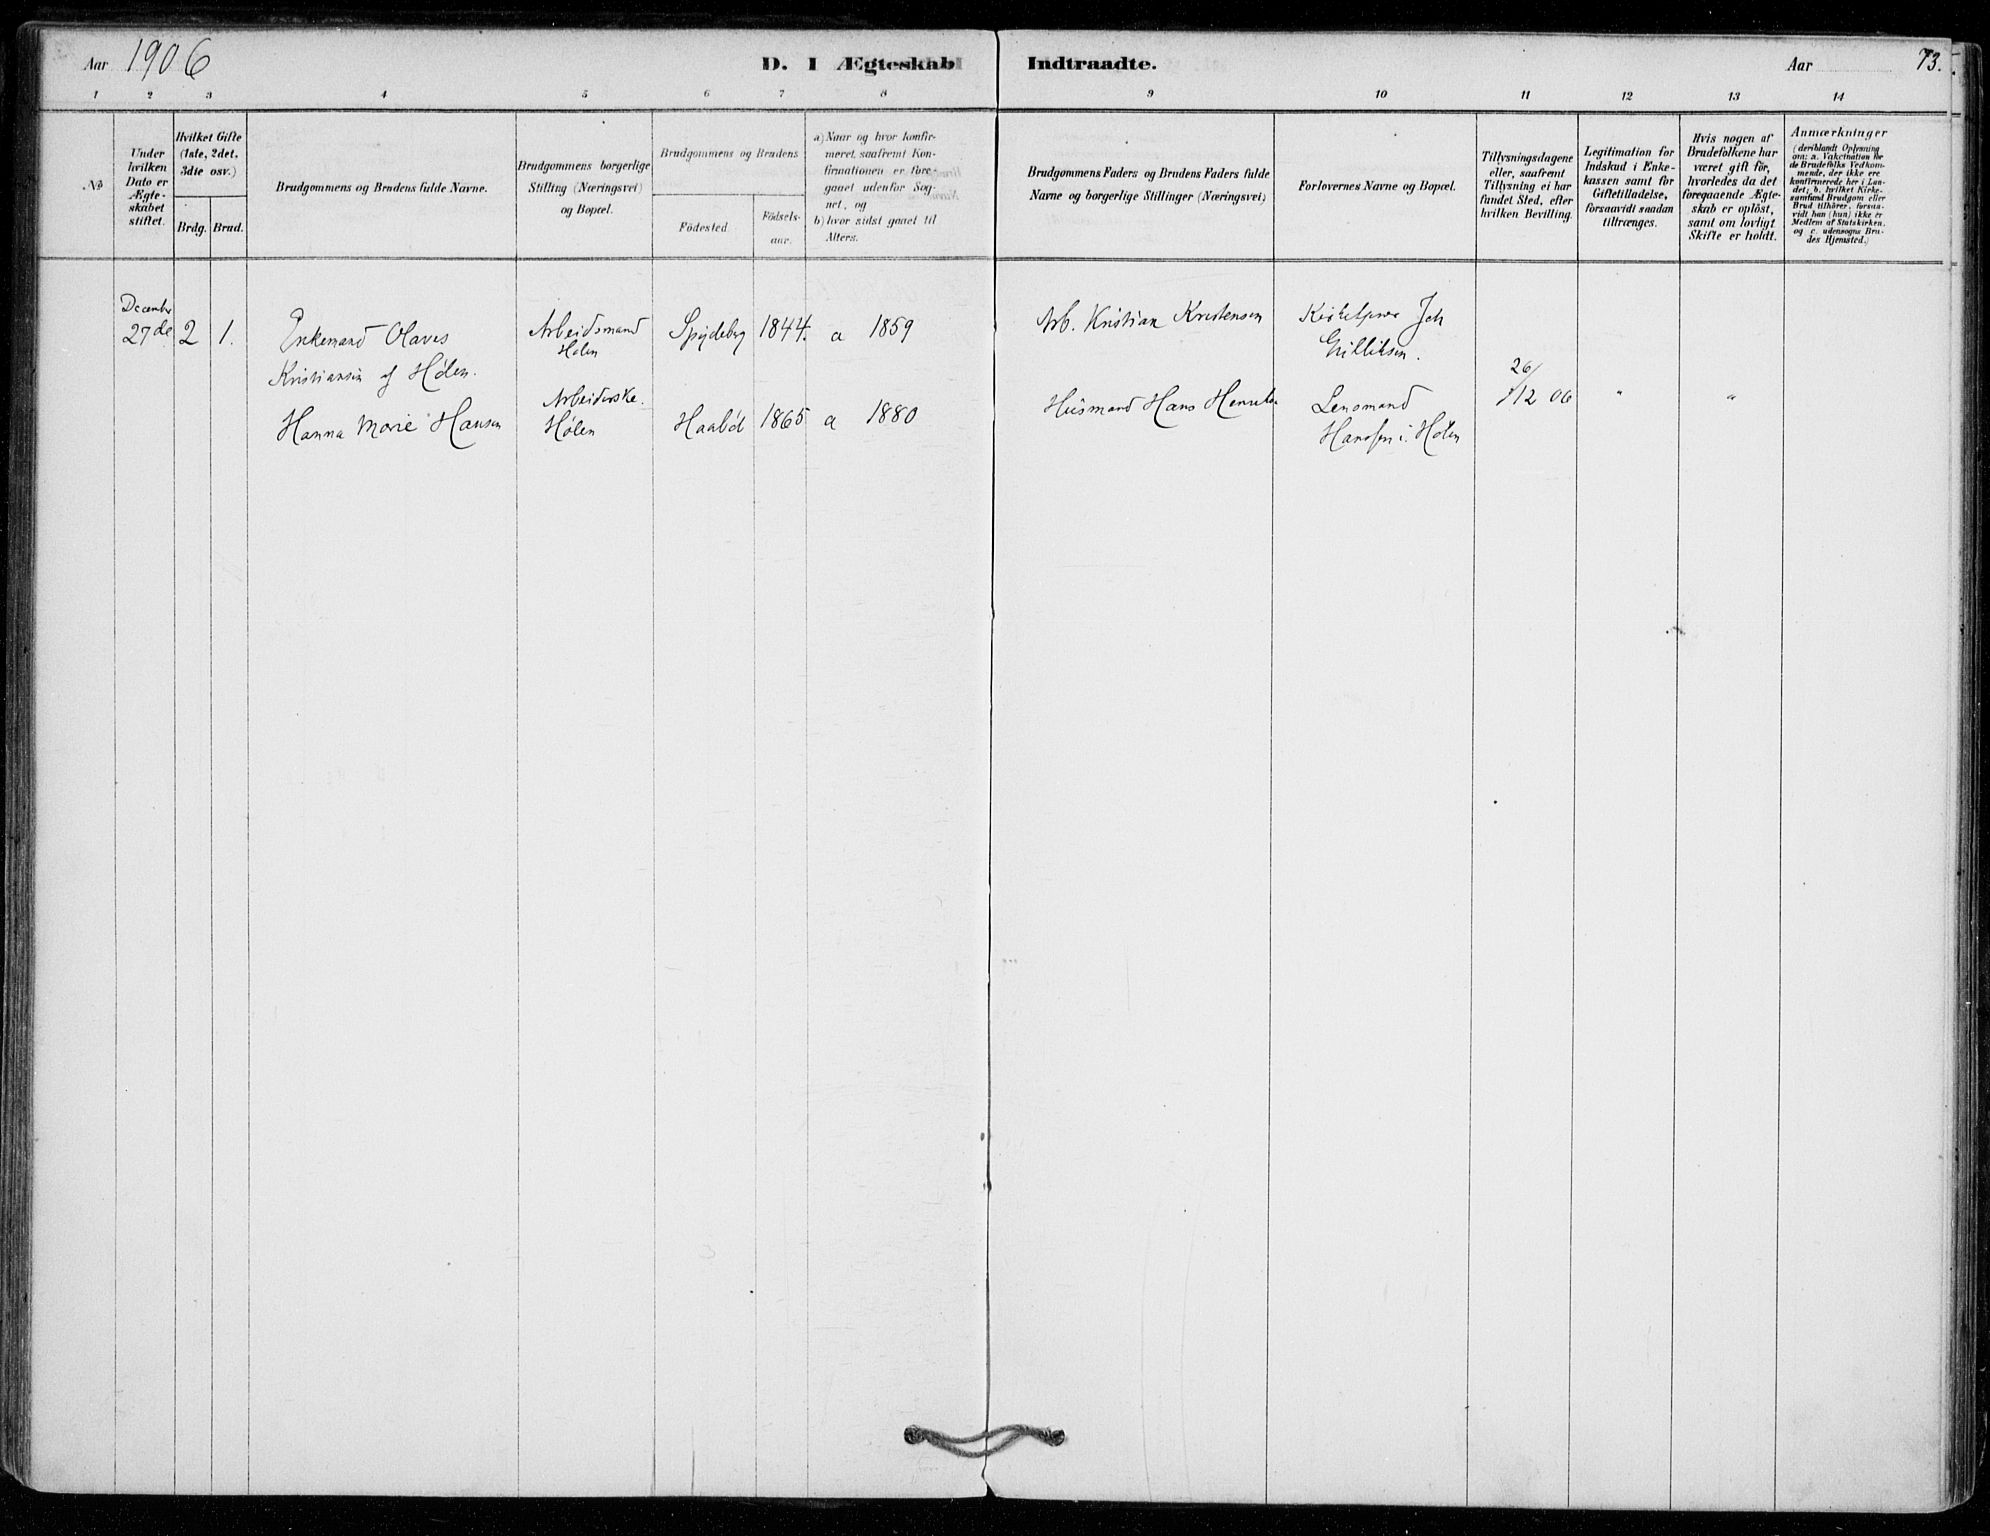 SAO, Vestby prestekontor Kirkebøker, F/Fe/L0001: Ministerialbok nr. V 1, 1878-1931, s. 73